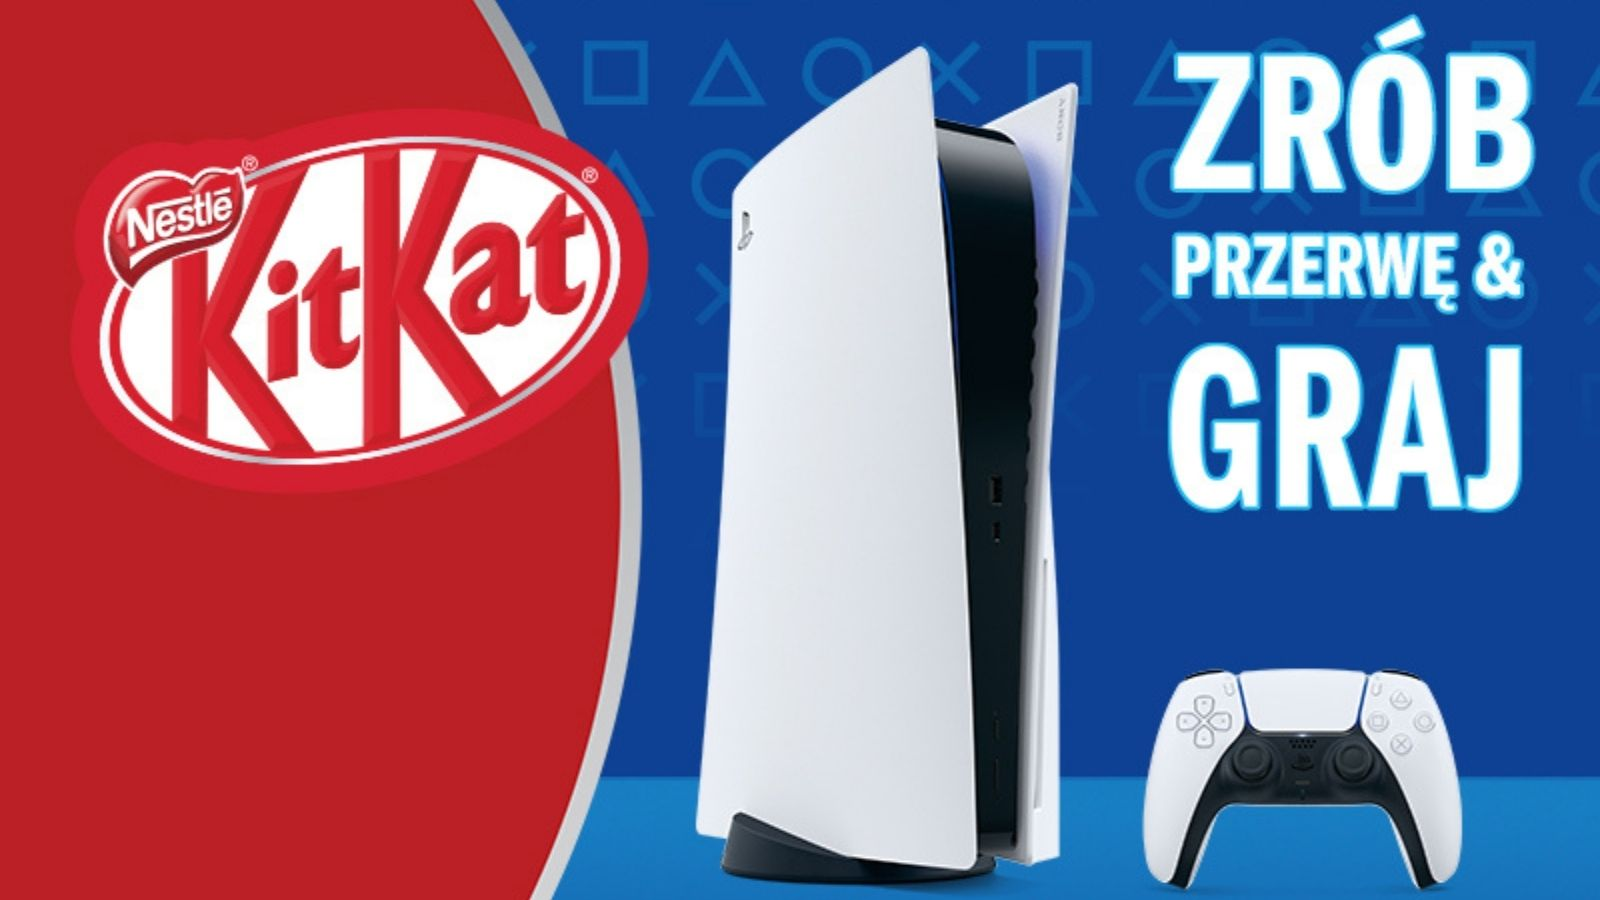 KitKat rozstrzygnął przetarg komunikacja mediarun kit kat